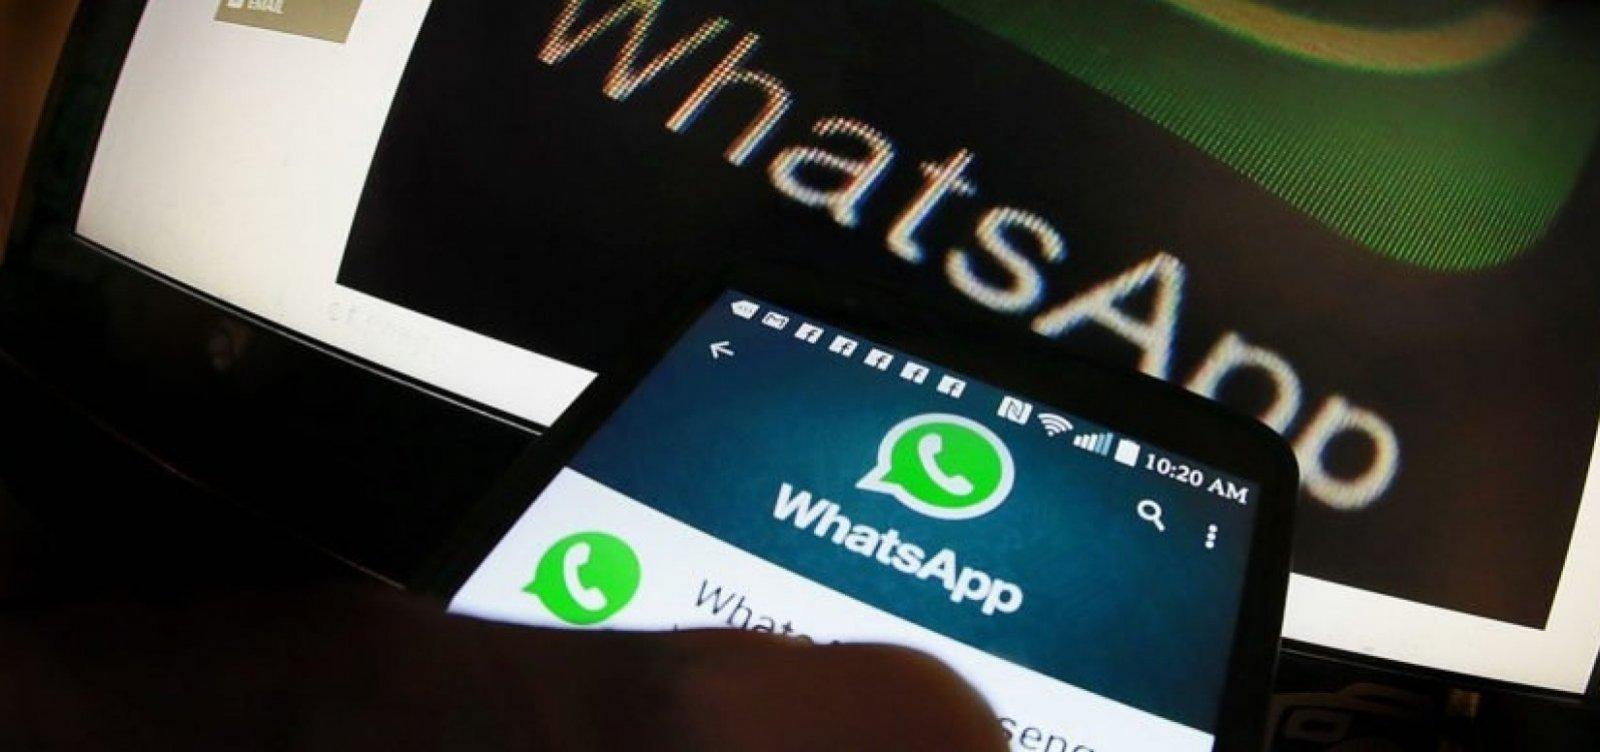 [Ibope: WhatsApp teve impacto limitado no 1º turno]